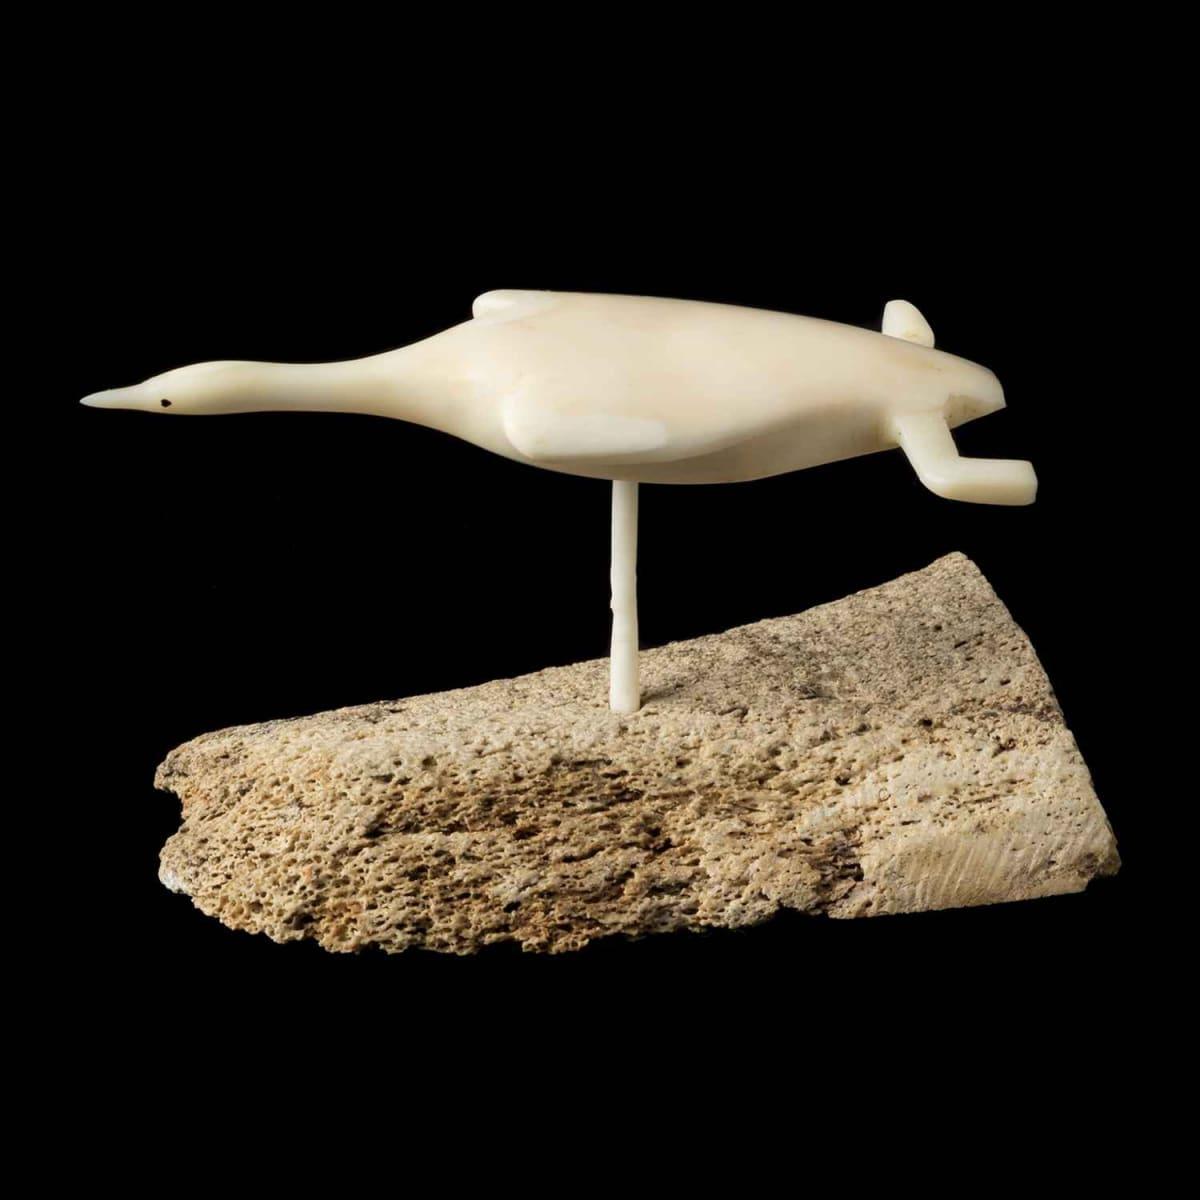 33. Attributed to: FABIEN OOGAAQ (1923-1992), KUGAARUK (PELLY BAY) Flying Bird, 1970